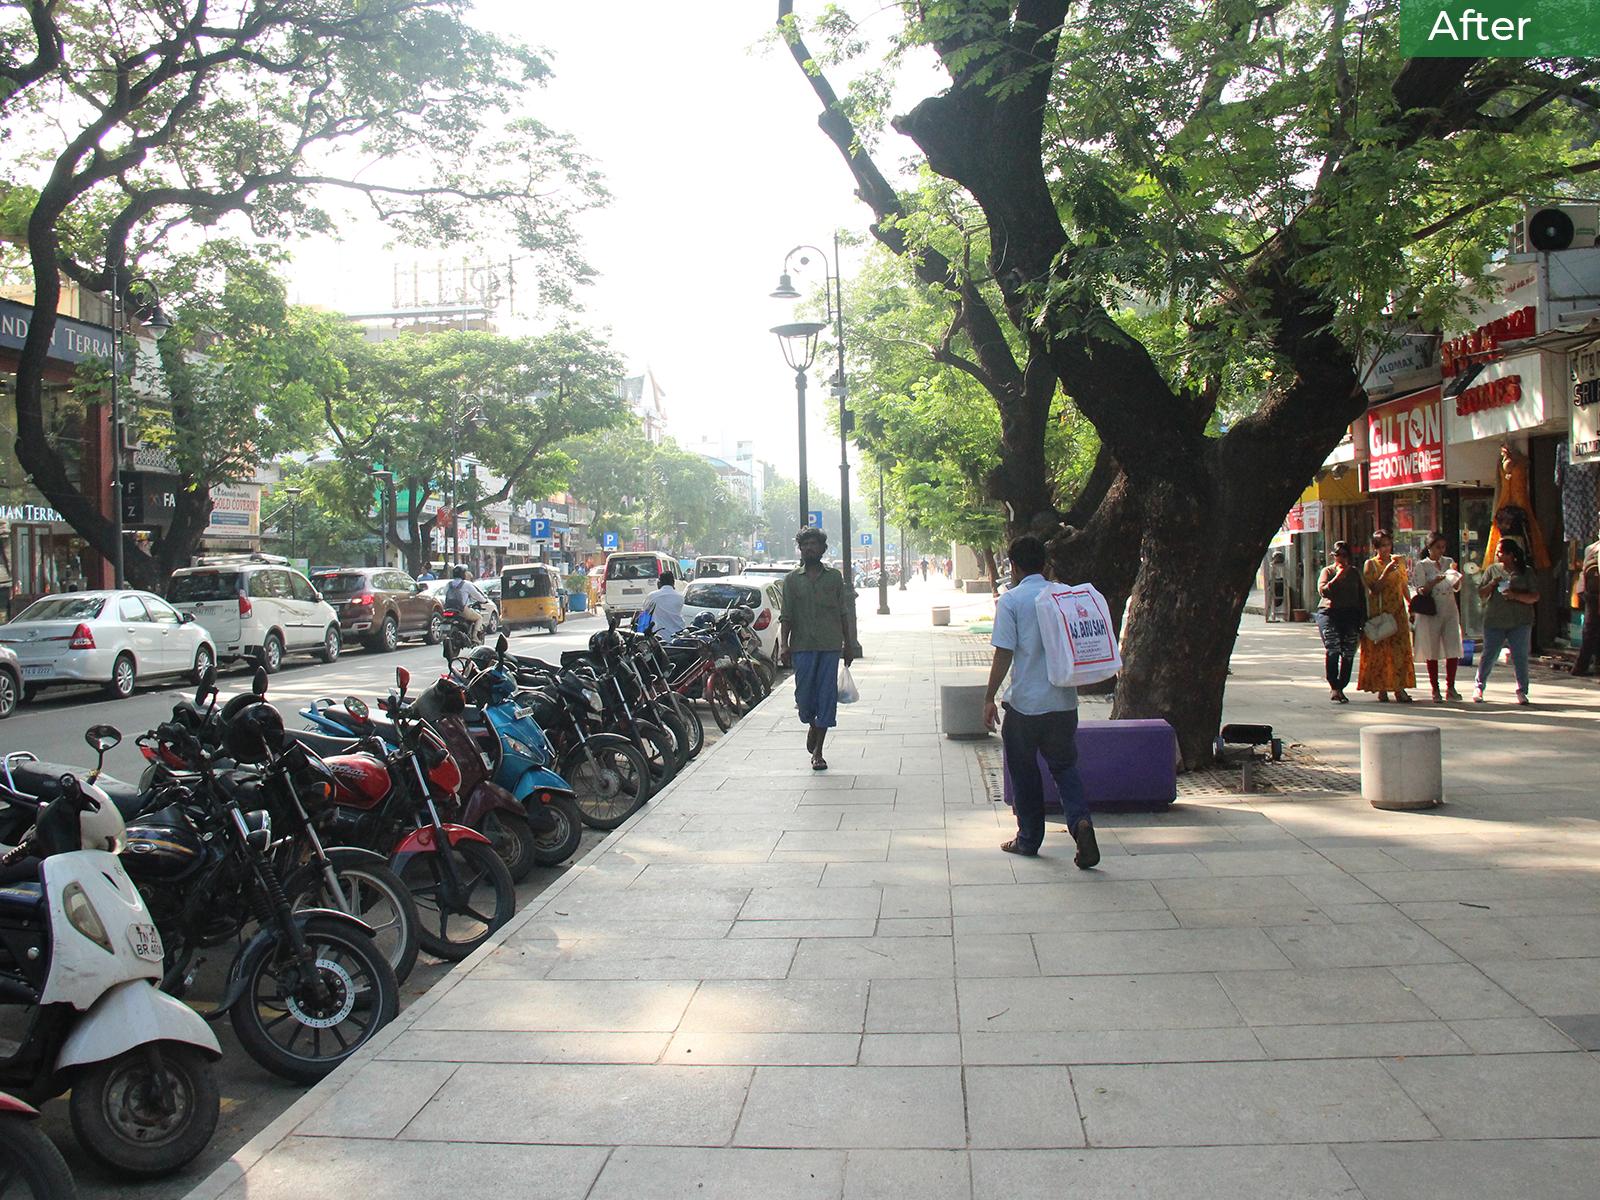 After-The Pondy Bazaar Pedestrian Plaza